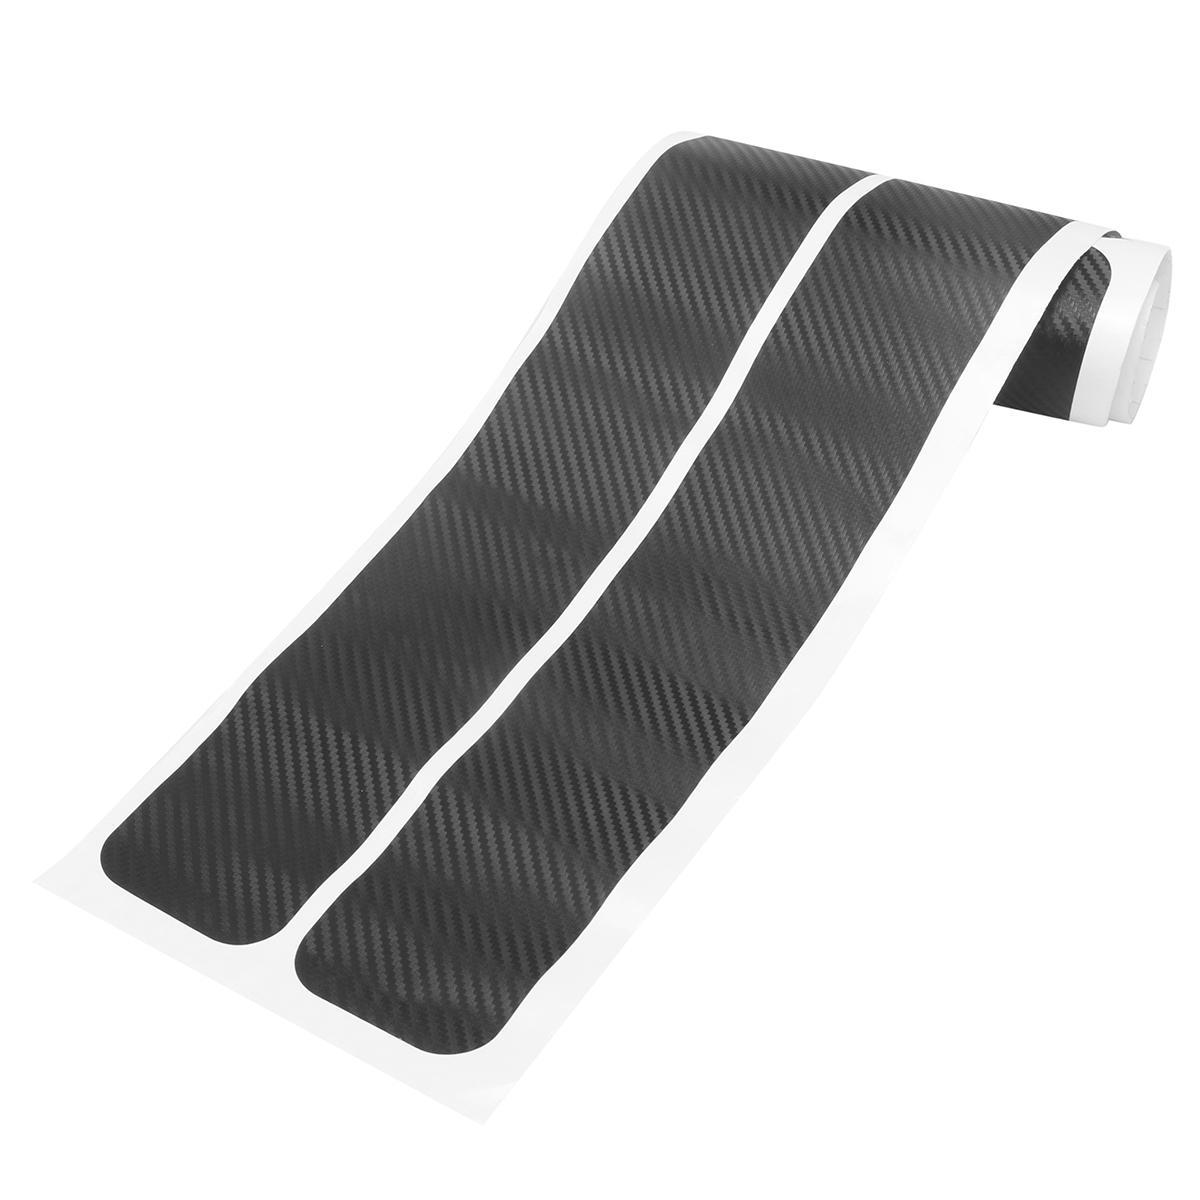 Polyethylene Car Rear Boot Trunk Cargo Dent Floor Protector Mat Tray for Honda Civic Sedan 2016-2018 - 1